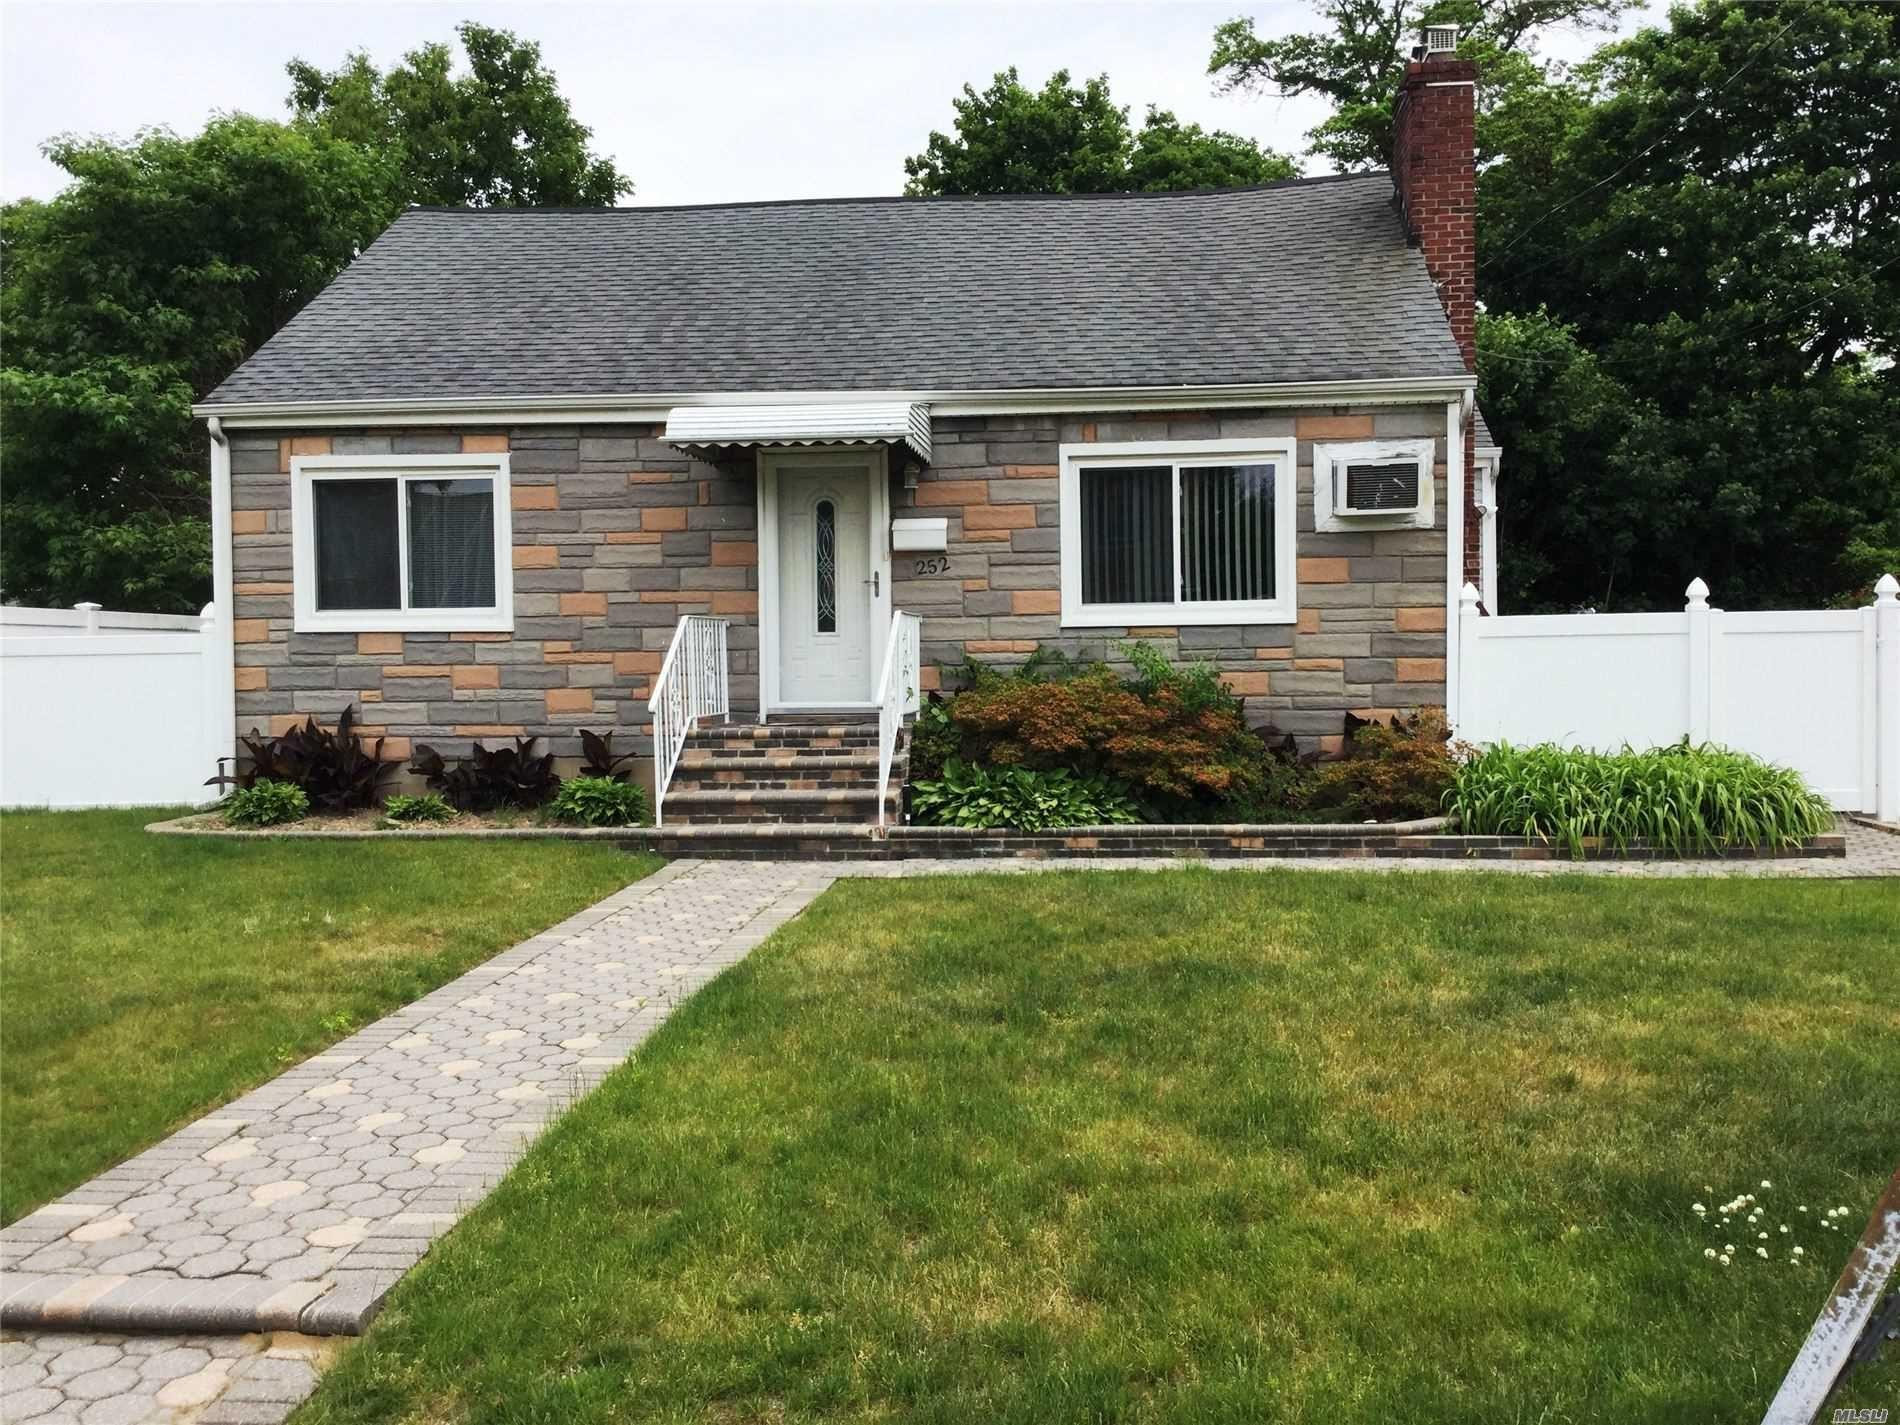 252 Garden St, Westbury, NY 11590 - MLS#: 3218835